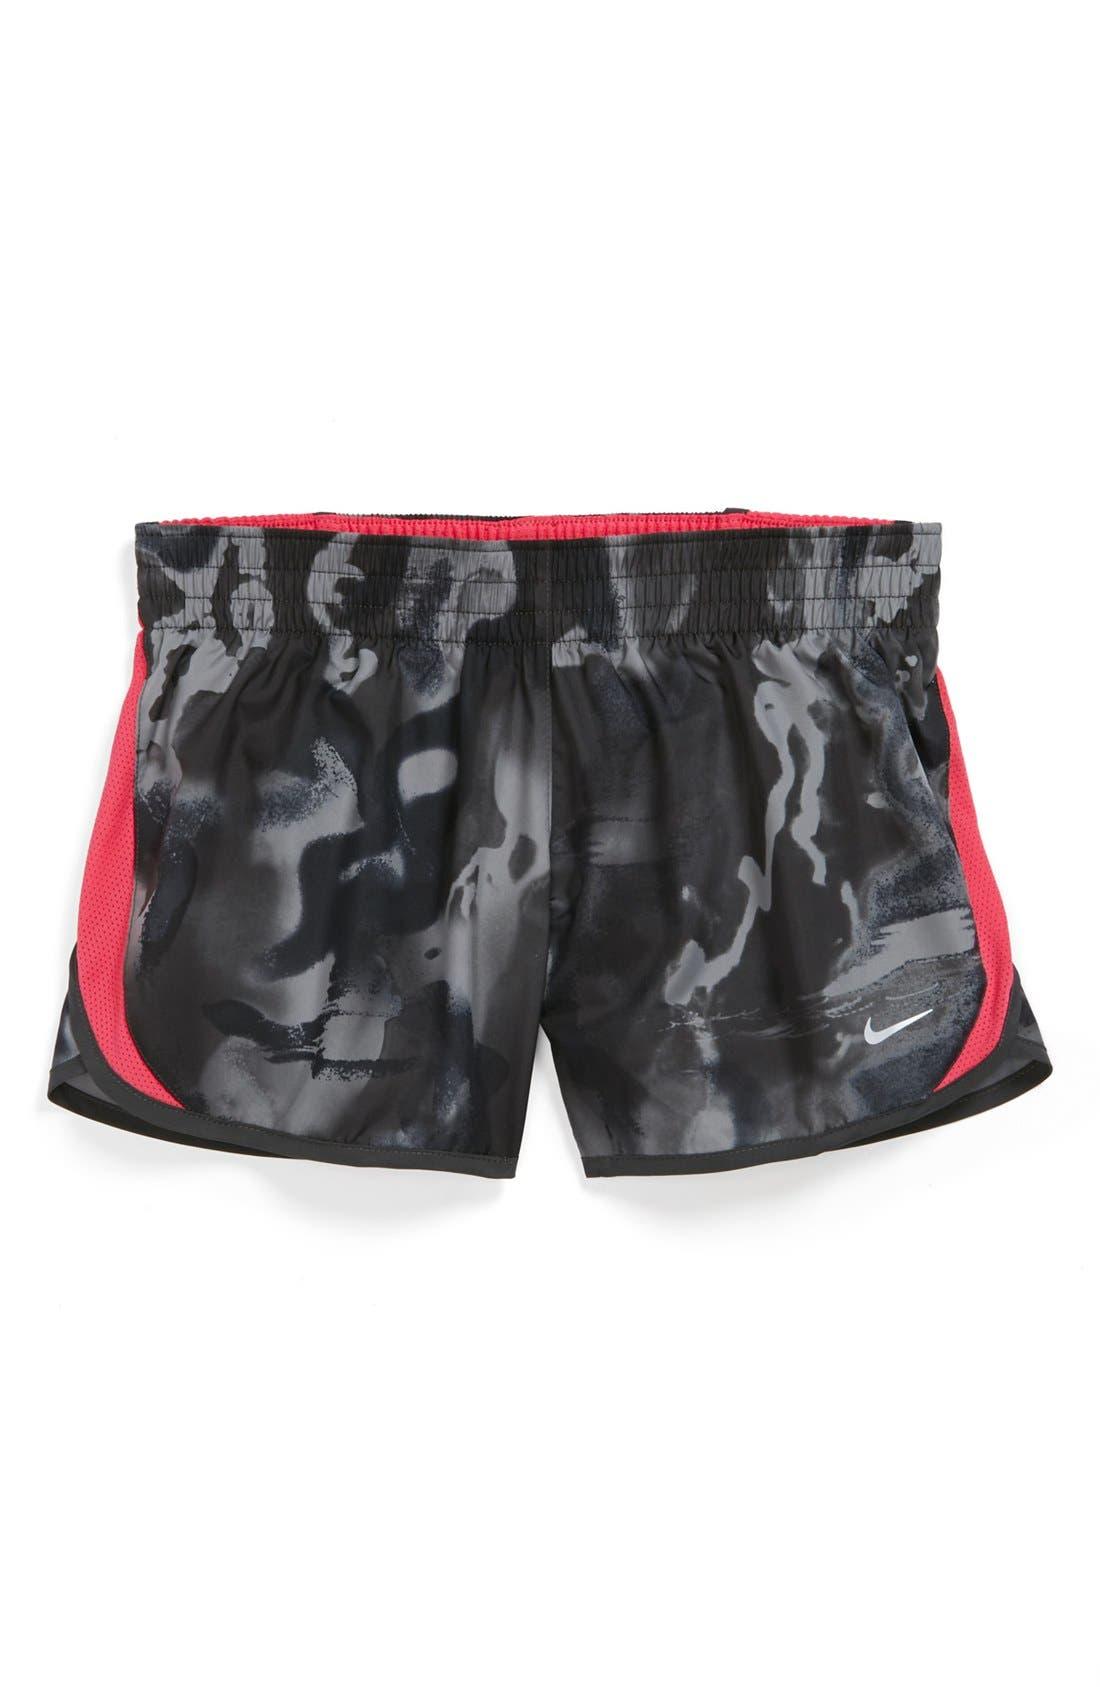 Main Image - Nike 'Dash' Dri-FIT Print Shorts (Big Girls)